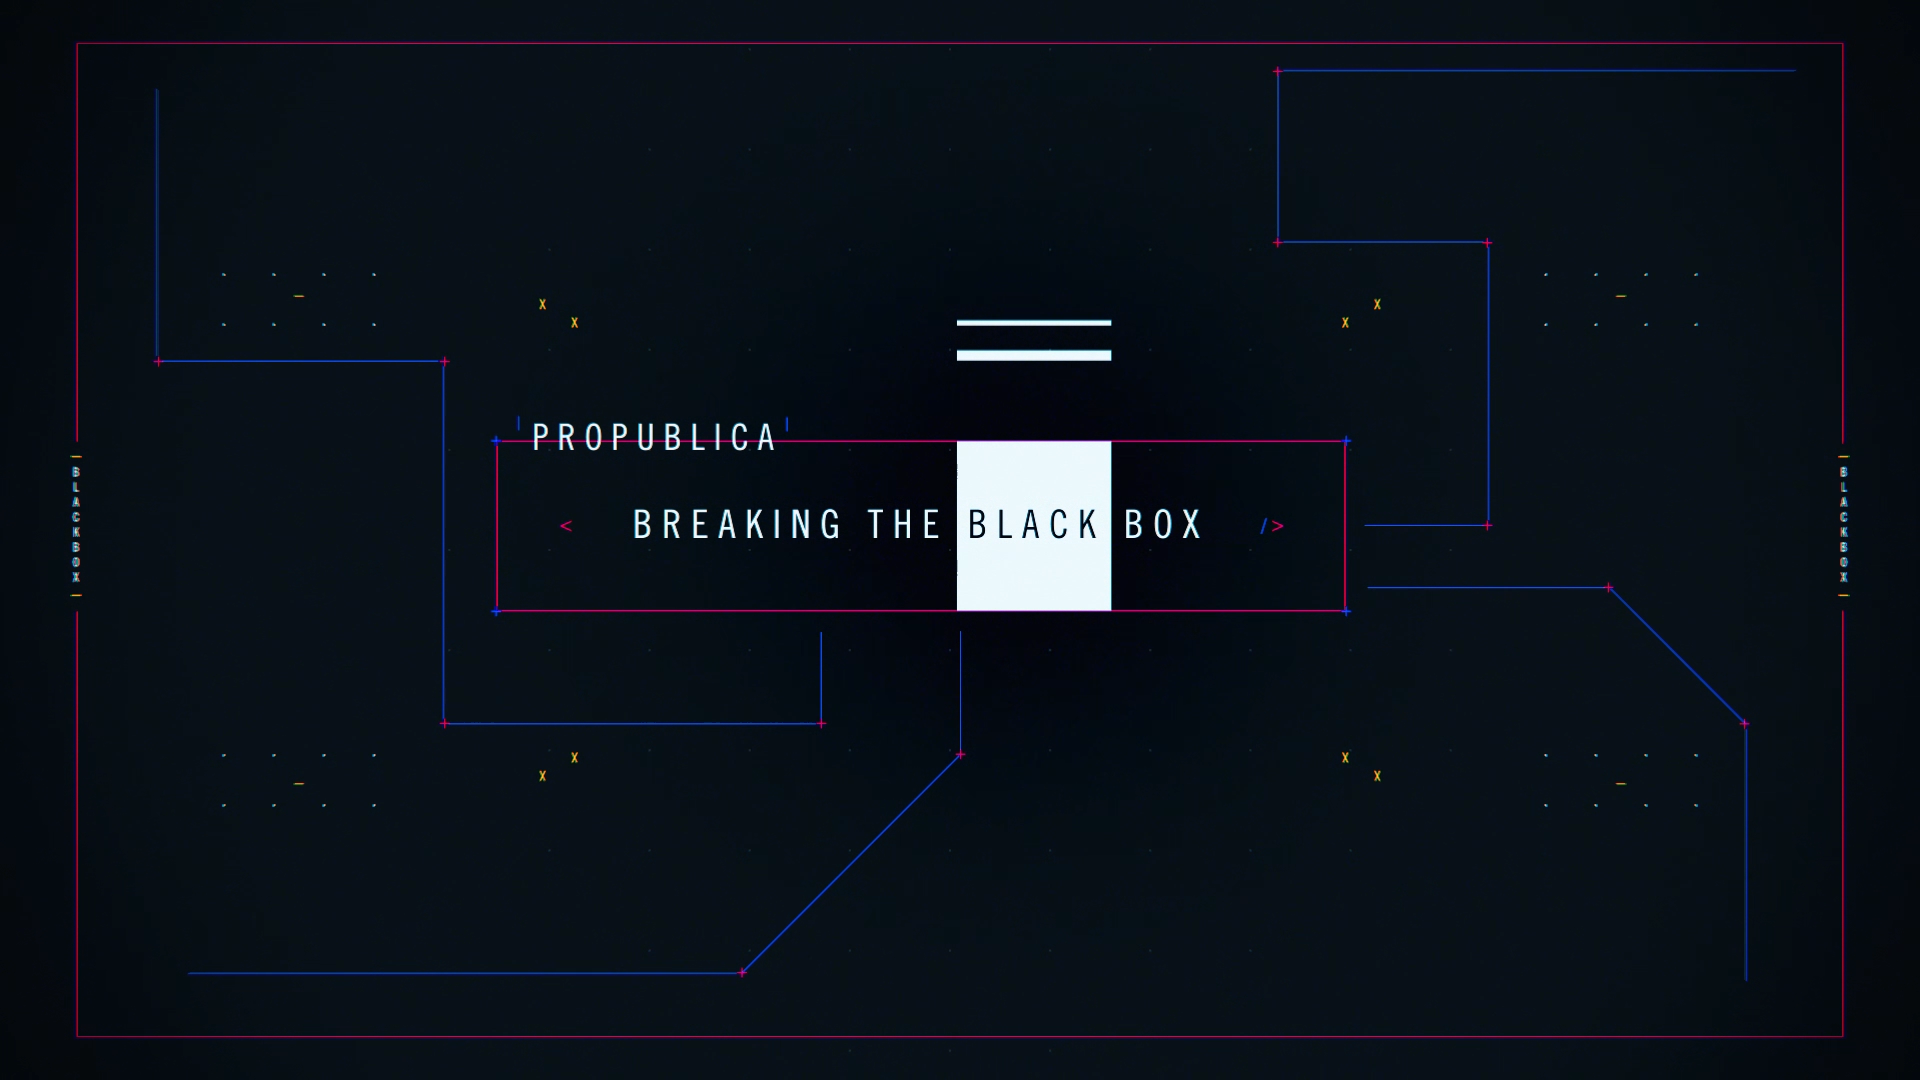 ProPublica_BlackBox_Data_Episode_1 FINAL_092216_00511.png